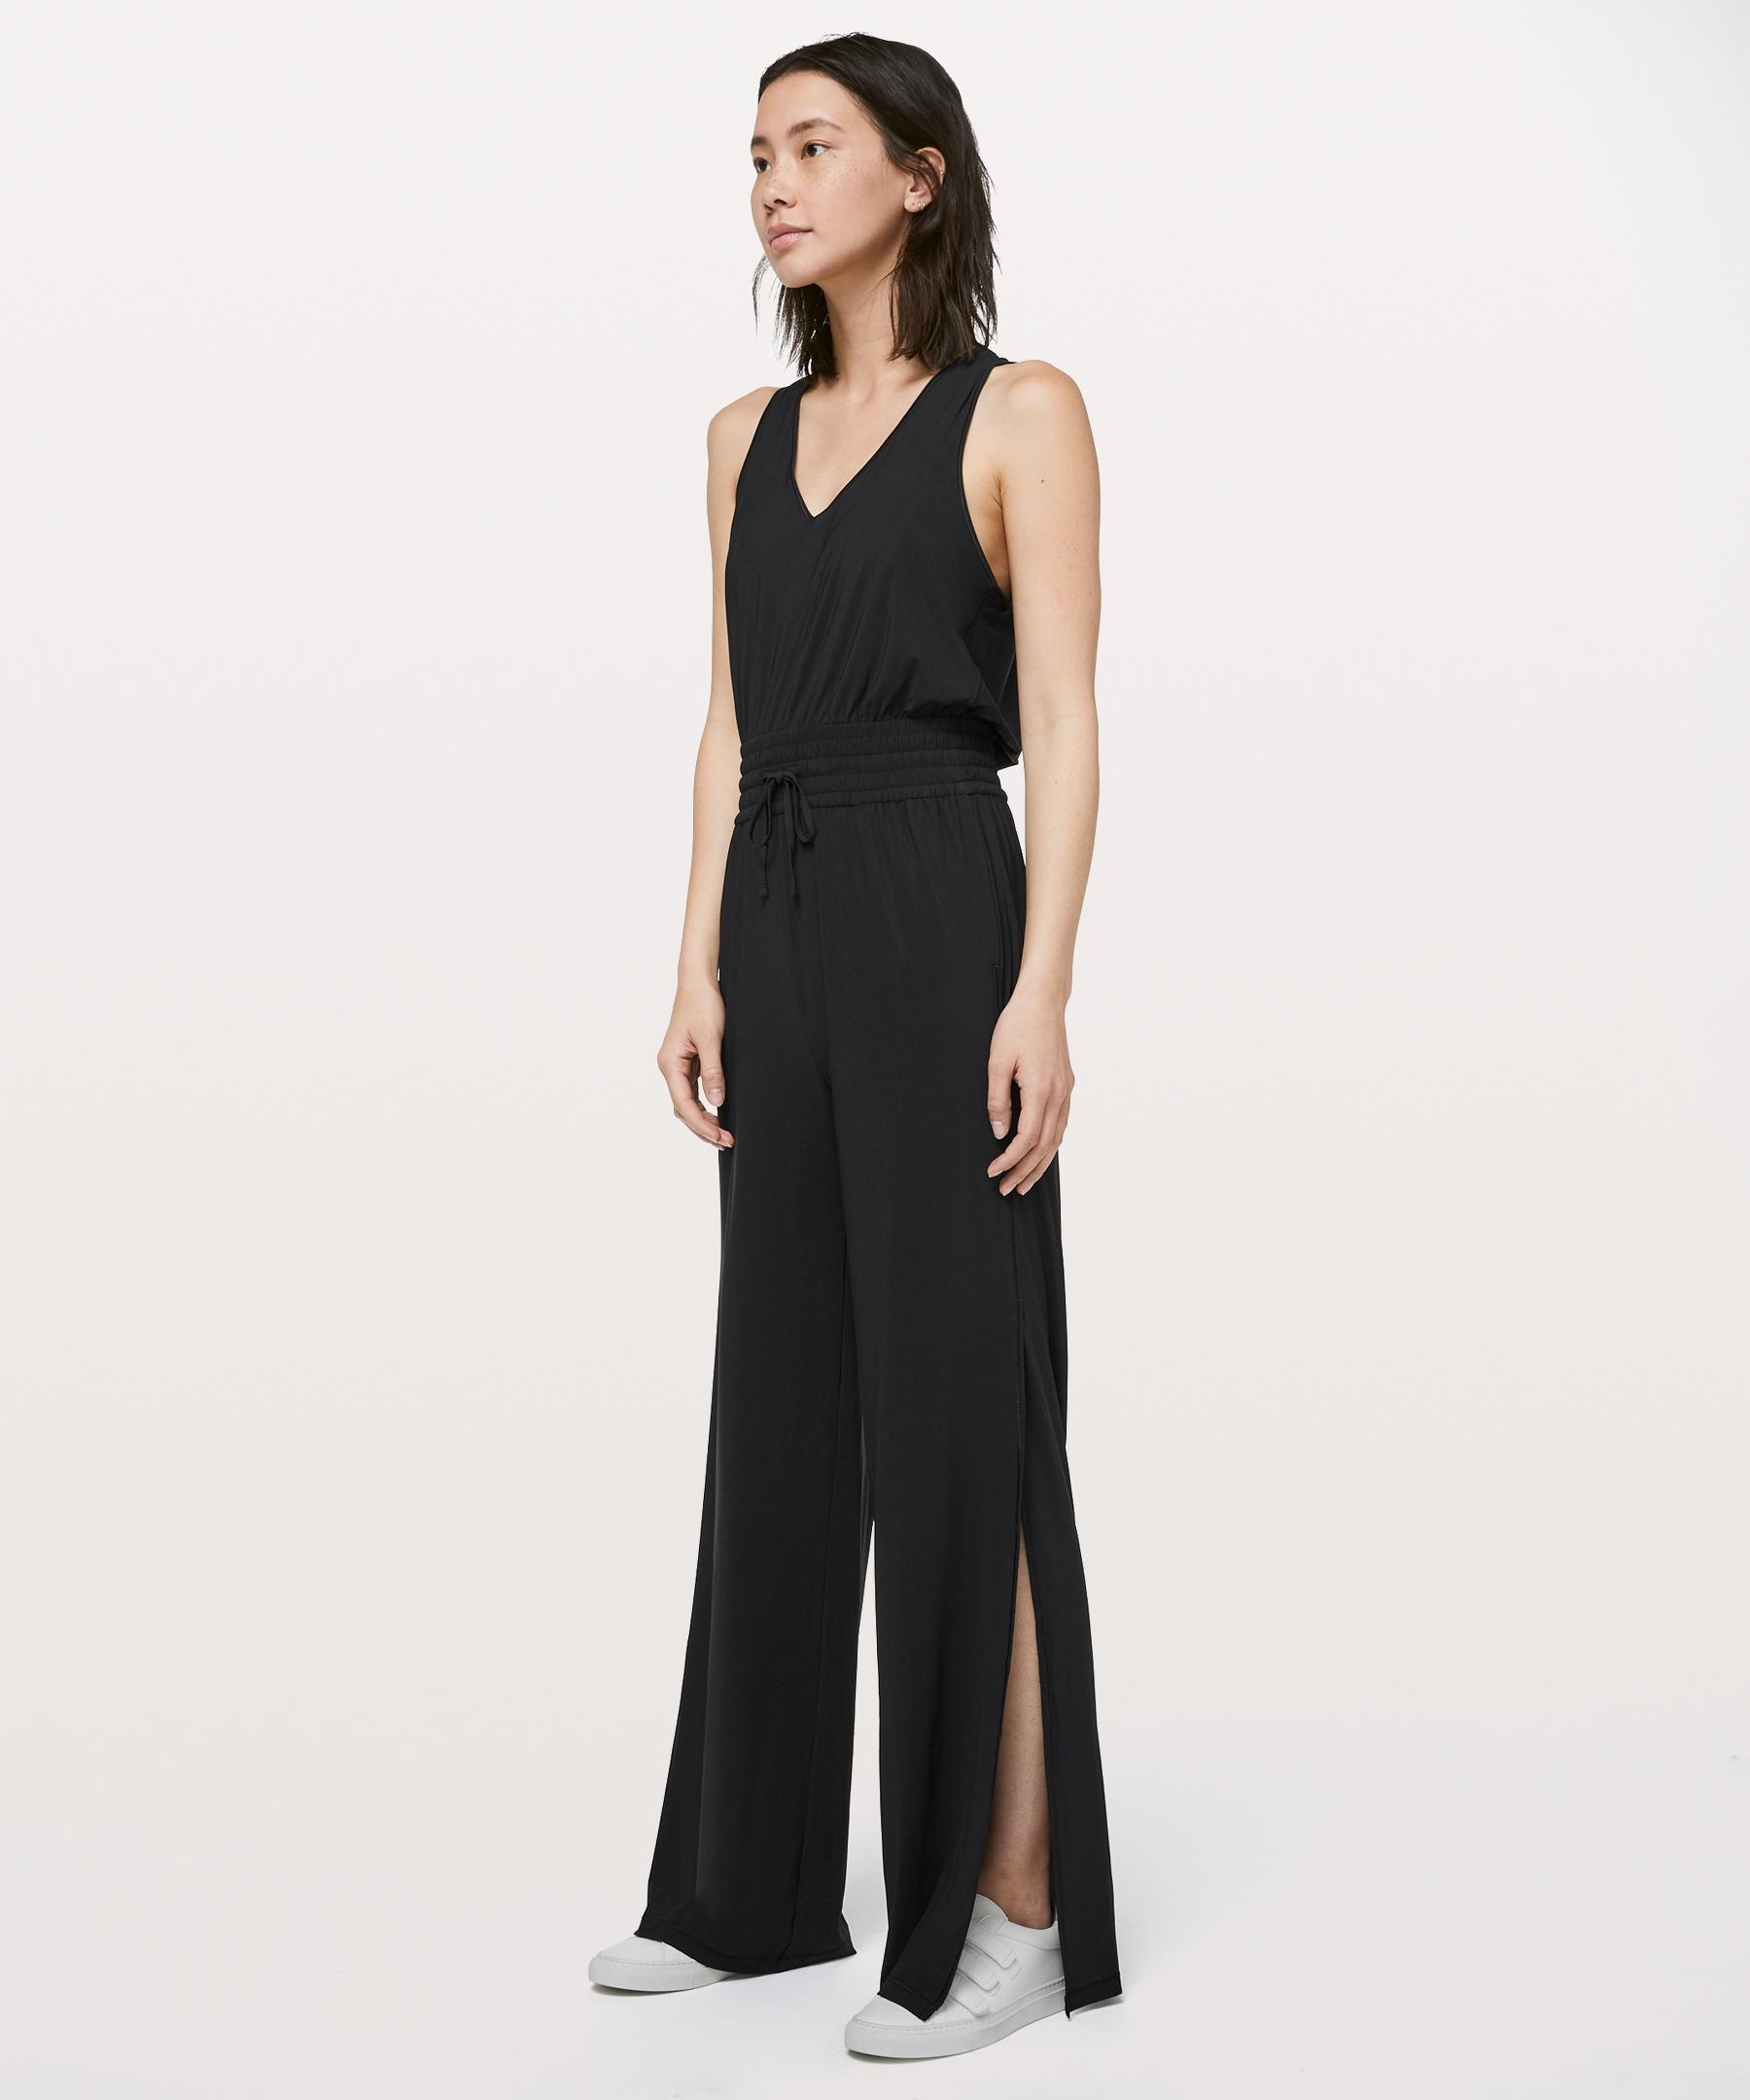 929e05c17ad lululemon Women's Keep Cruising Jumpsuit Online Only, Black, Size 12 ...